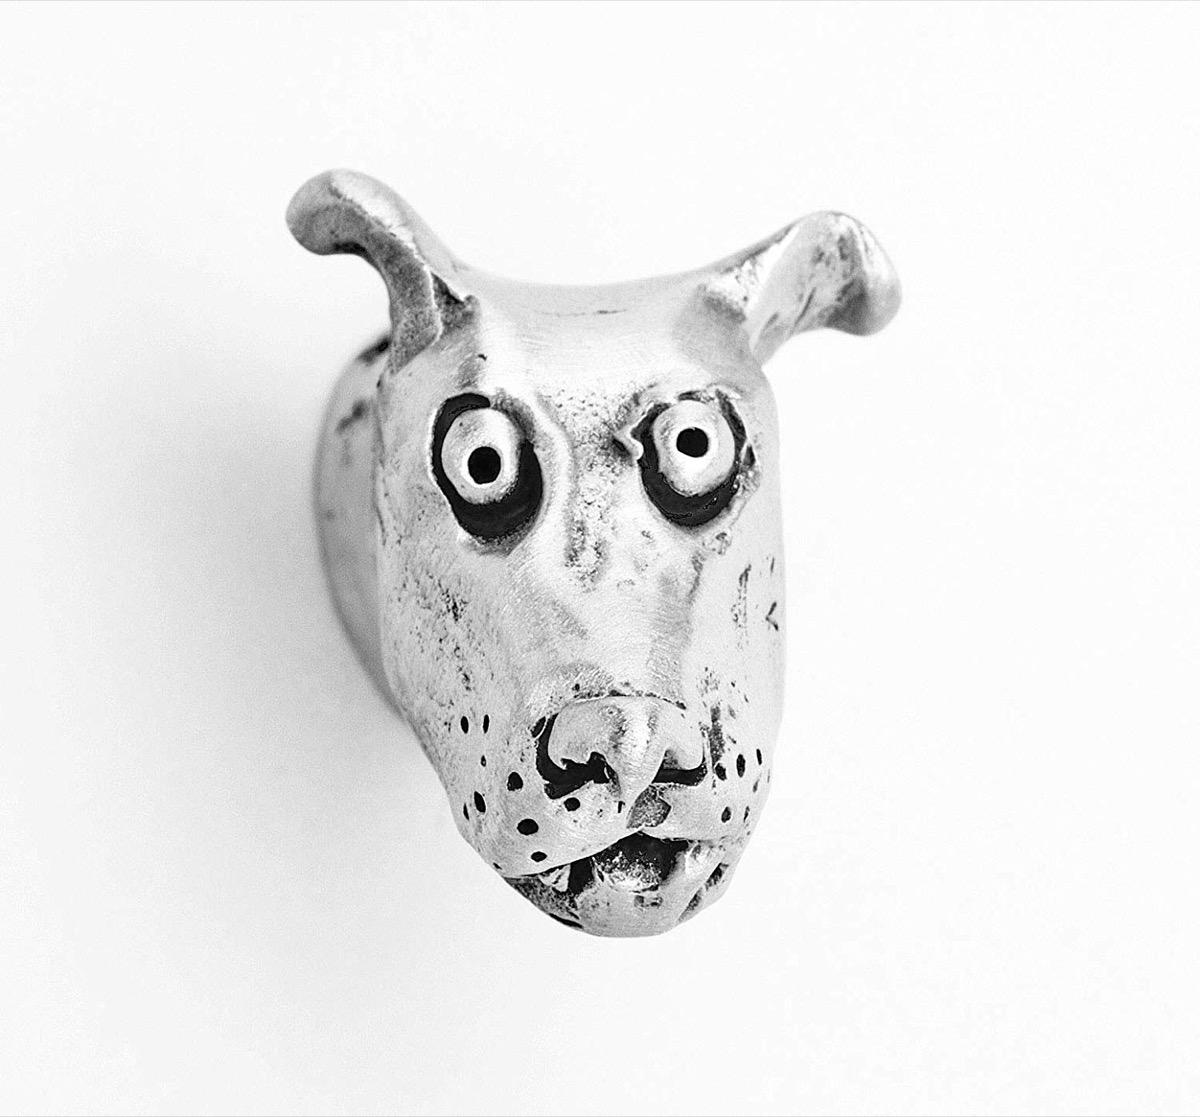 Dog-Shaped Drawer Knob {Handmade Items from Amazon}